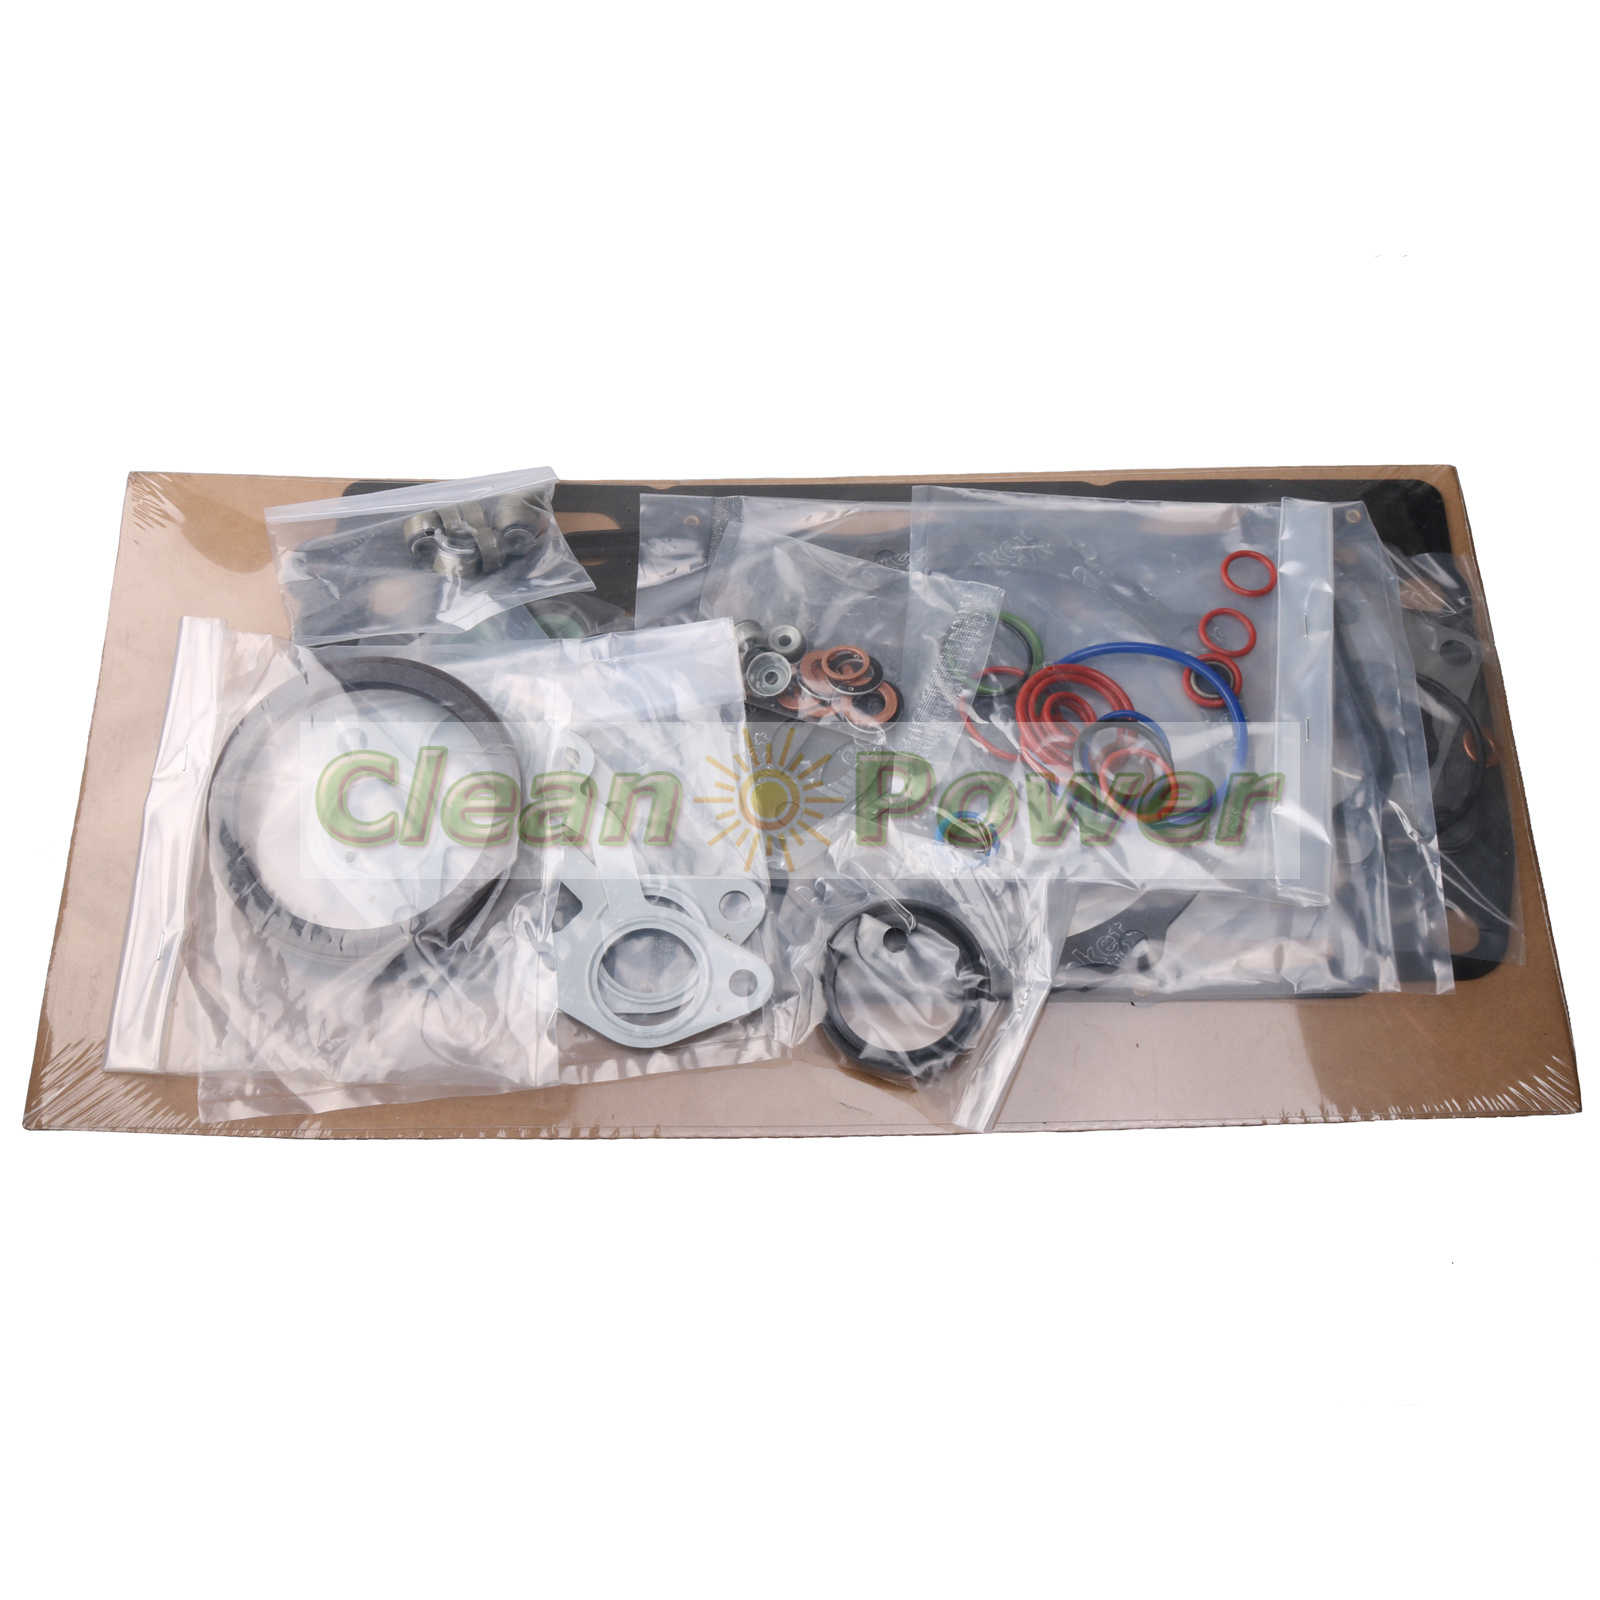 Yanmar 3D76E 3TNV76 Full Head Gasket Set kit Fit John Deere 2305H 2320H Tractors